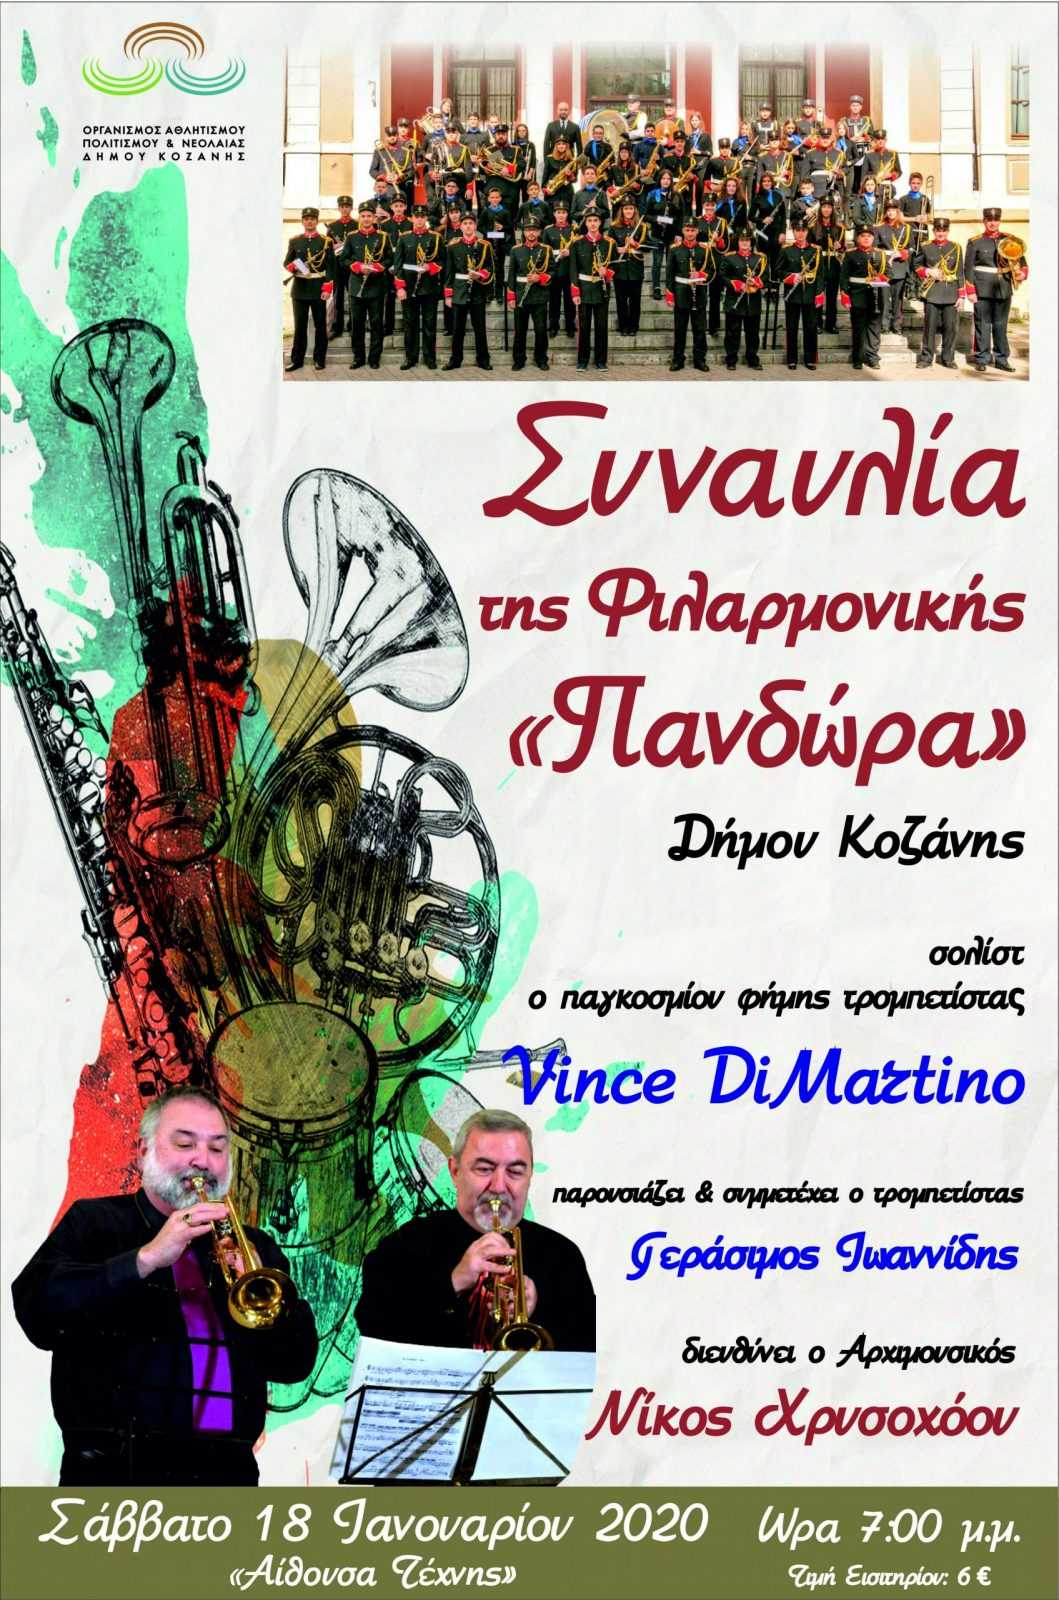 Master Class χάλκινων πνευστών στο Δημοτικό Ωδείο Κοζάνης  με τον διάσημο Αμερικανό σολίστ Vince Di Martino